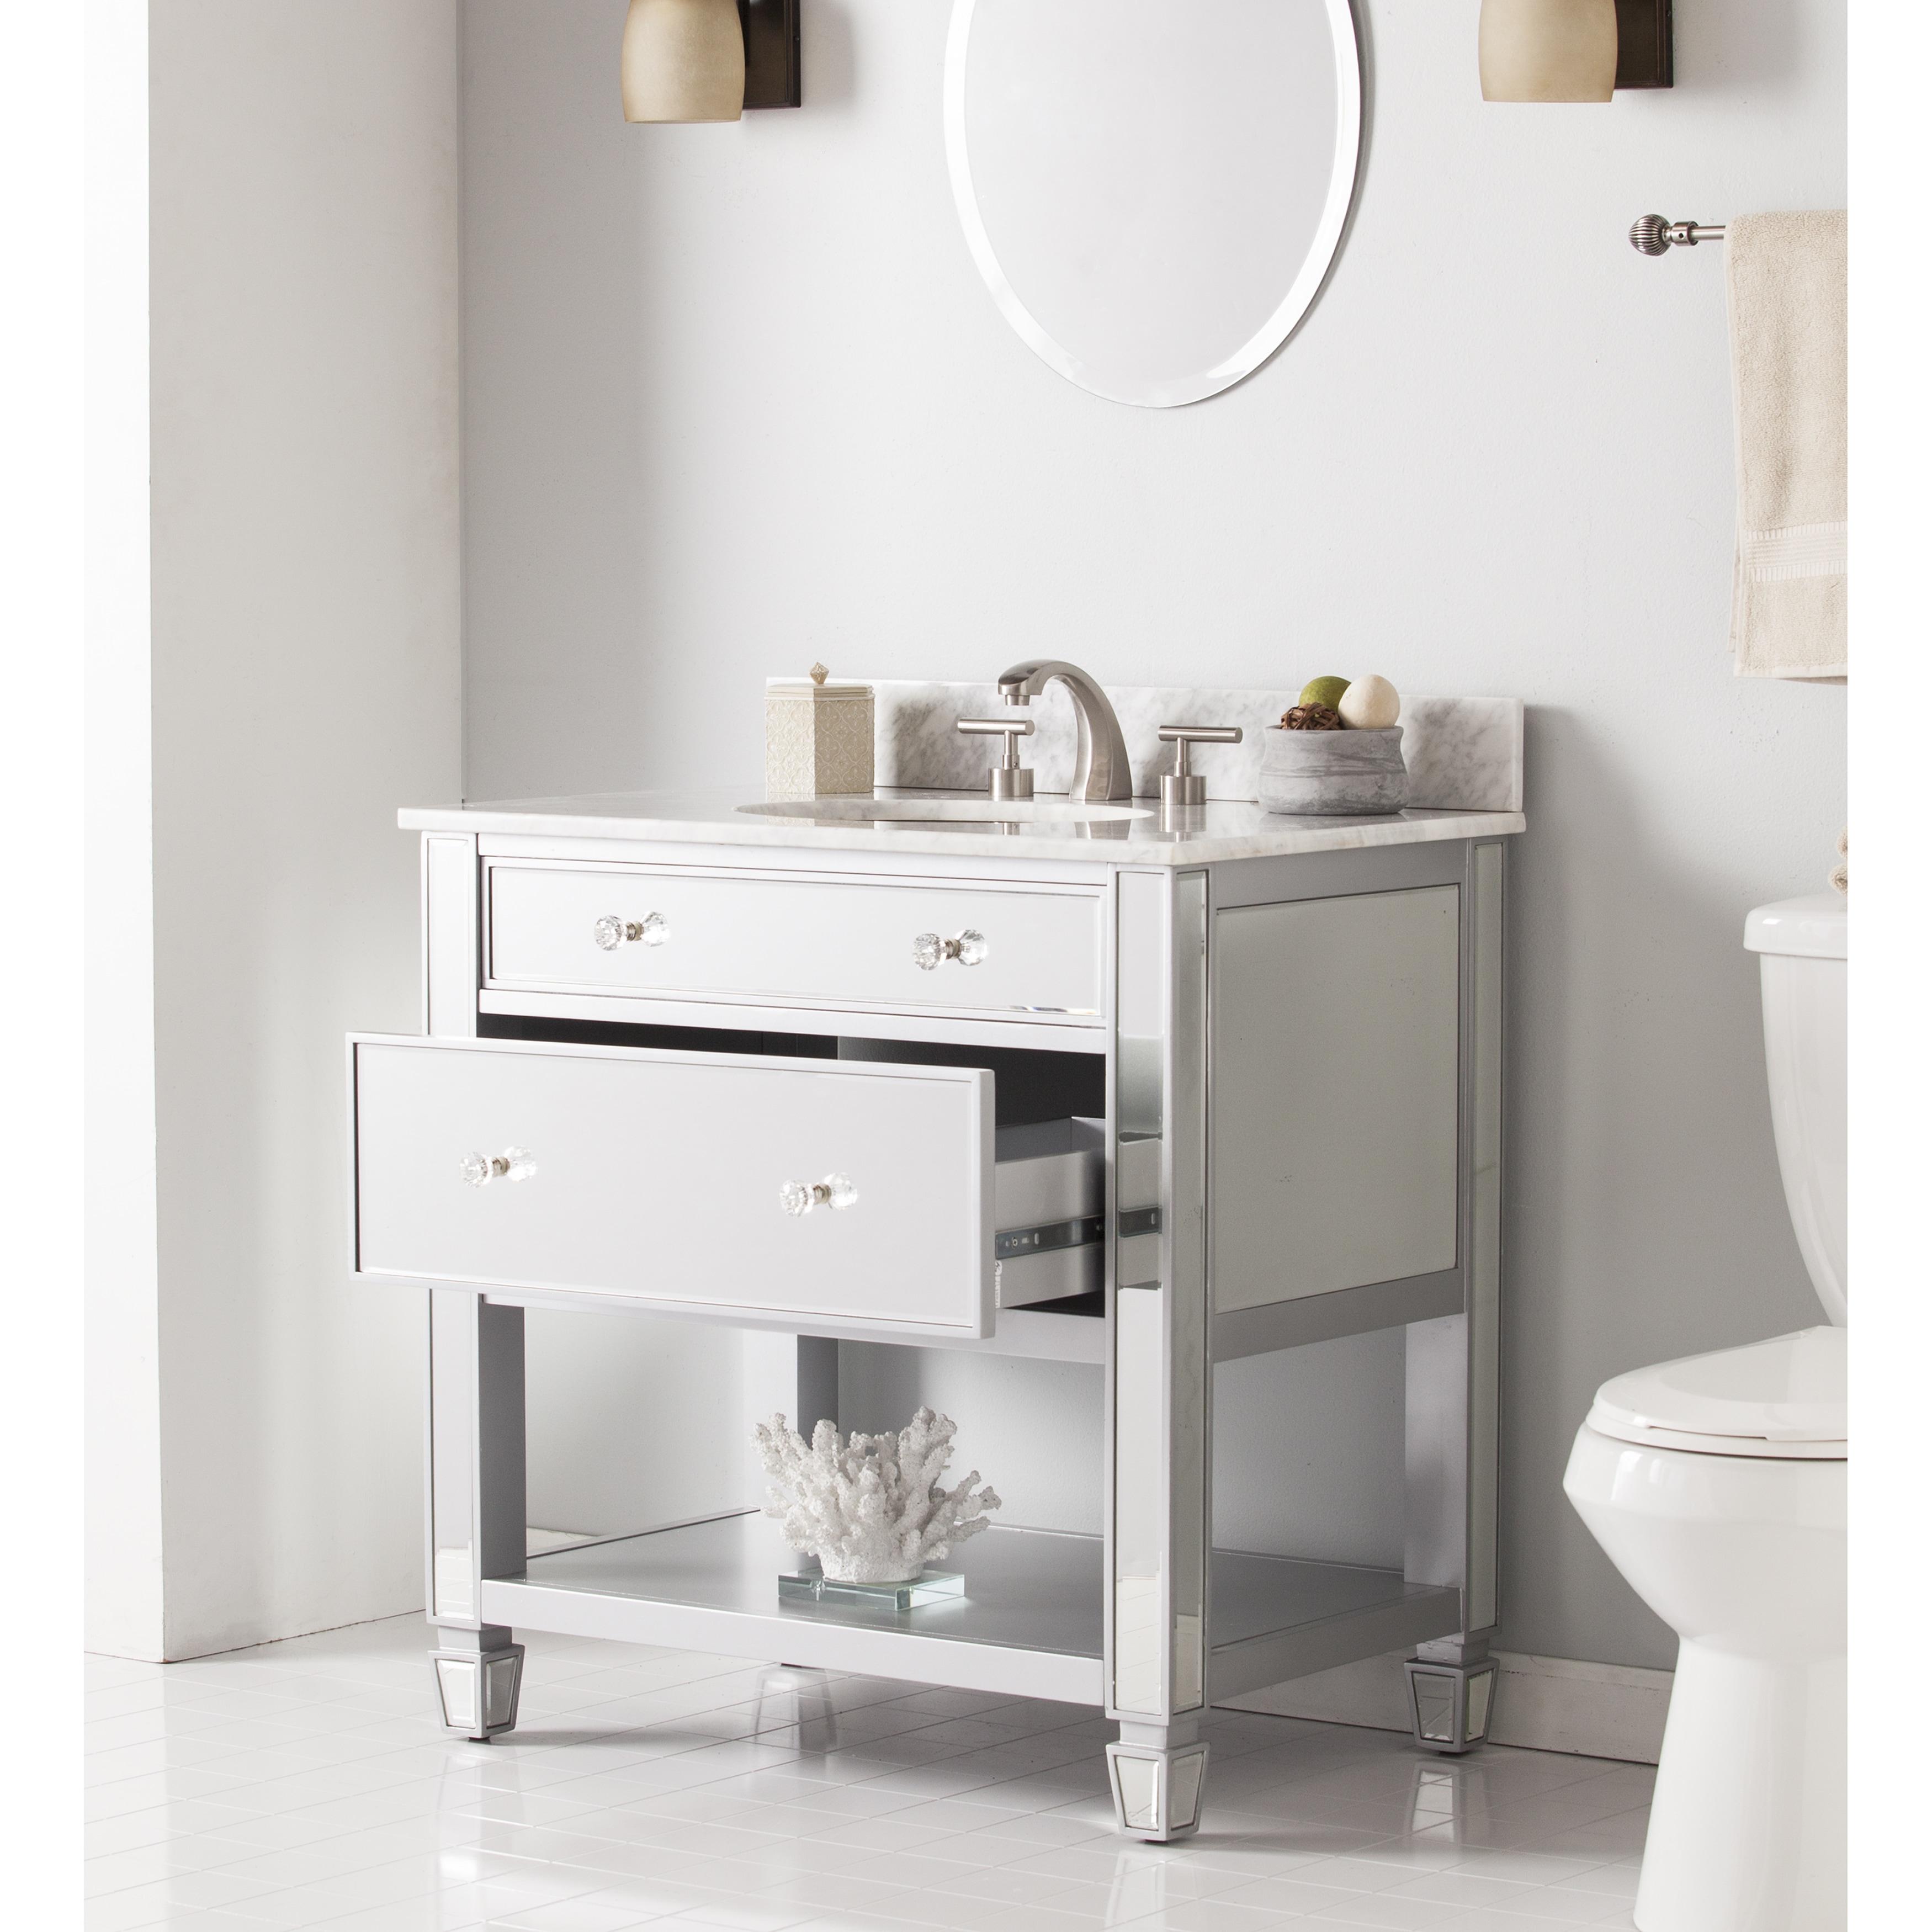 blvd top vanity does bath apply harper not itm granite laird ebay sink